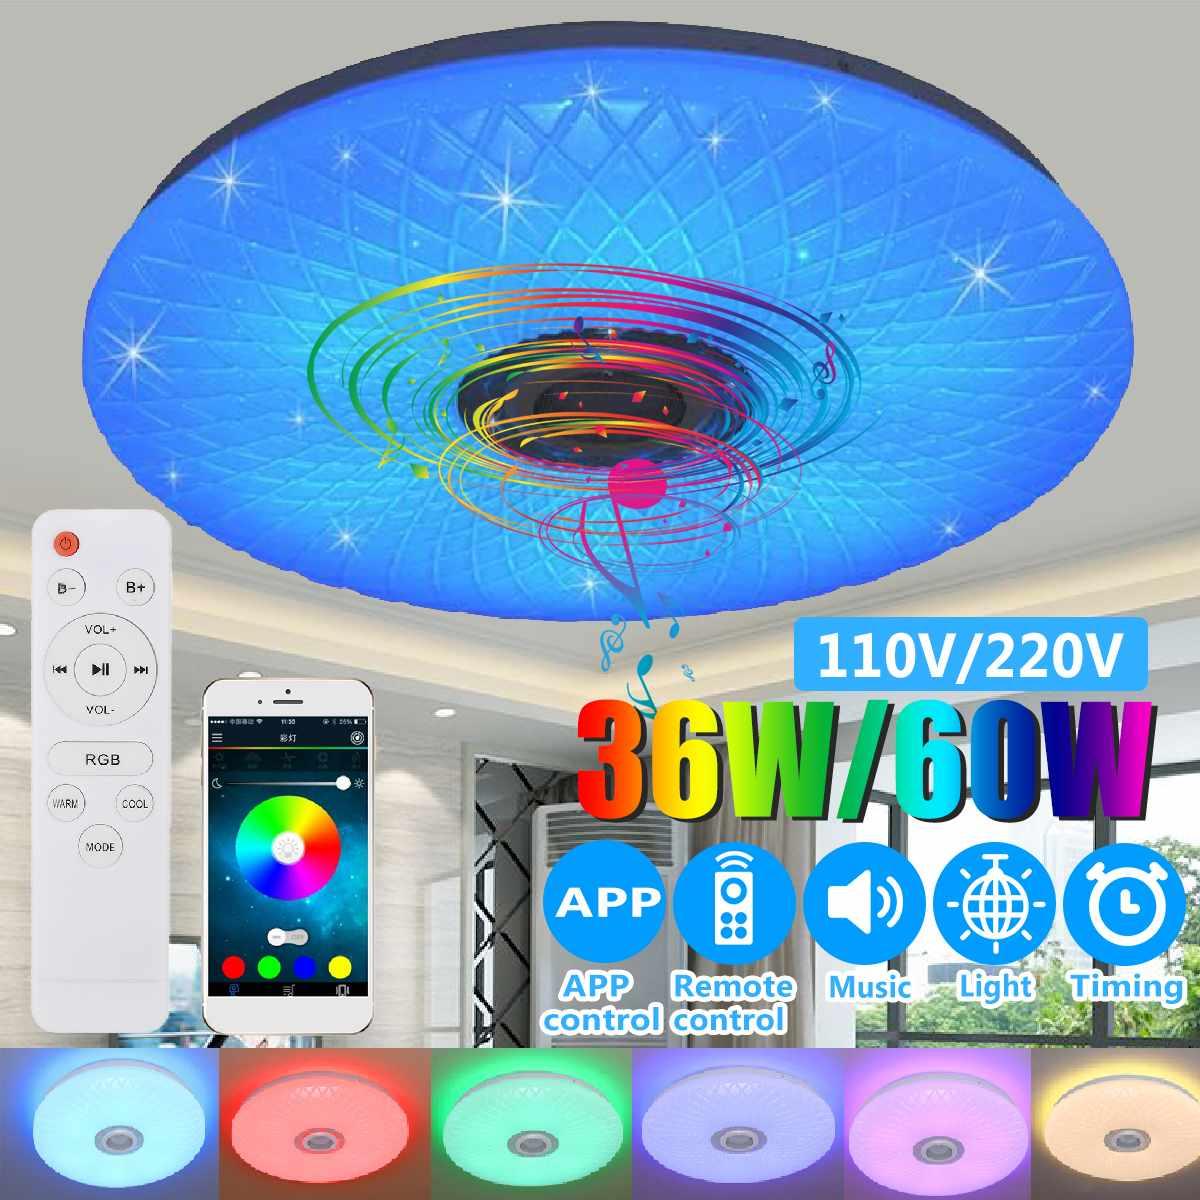 Modern RGB LED Ceiling Light Home Lighing 36W/60W 40cm APP Remote Control Bluetooth Music Light Bedroom Lamp Smart Ceiling Lamp